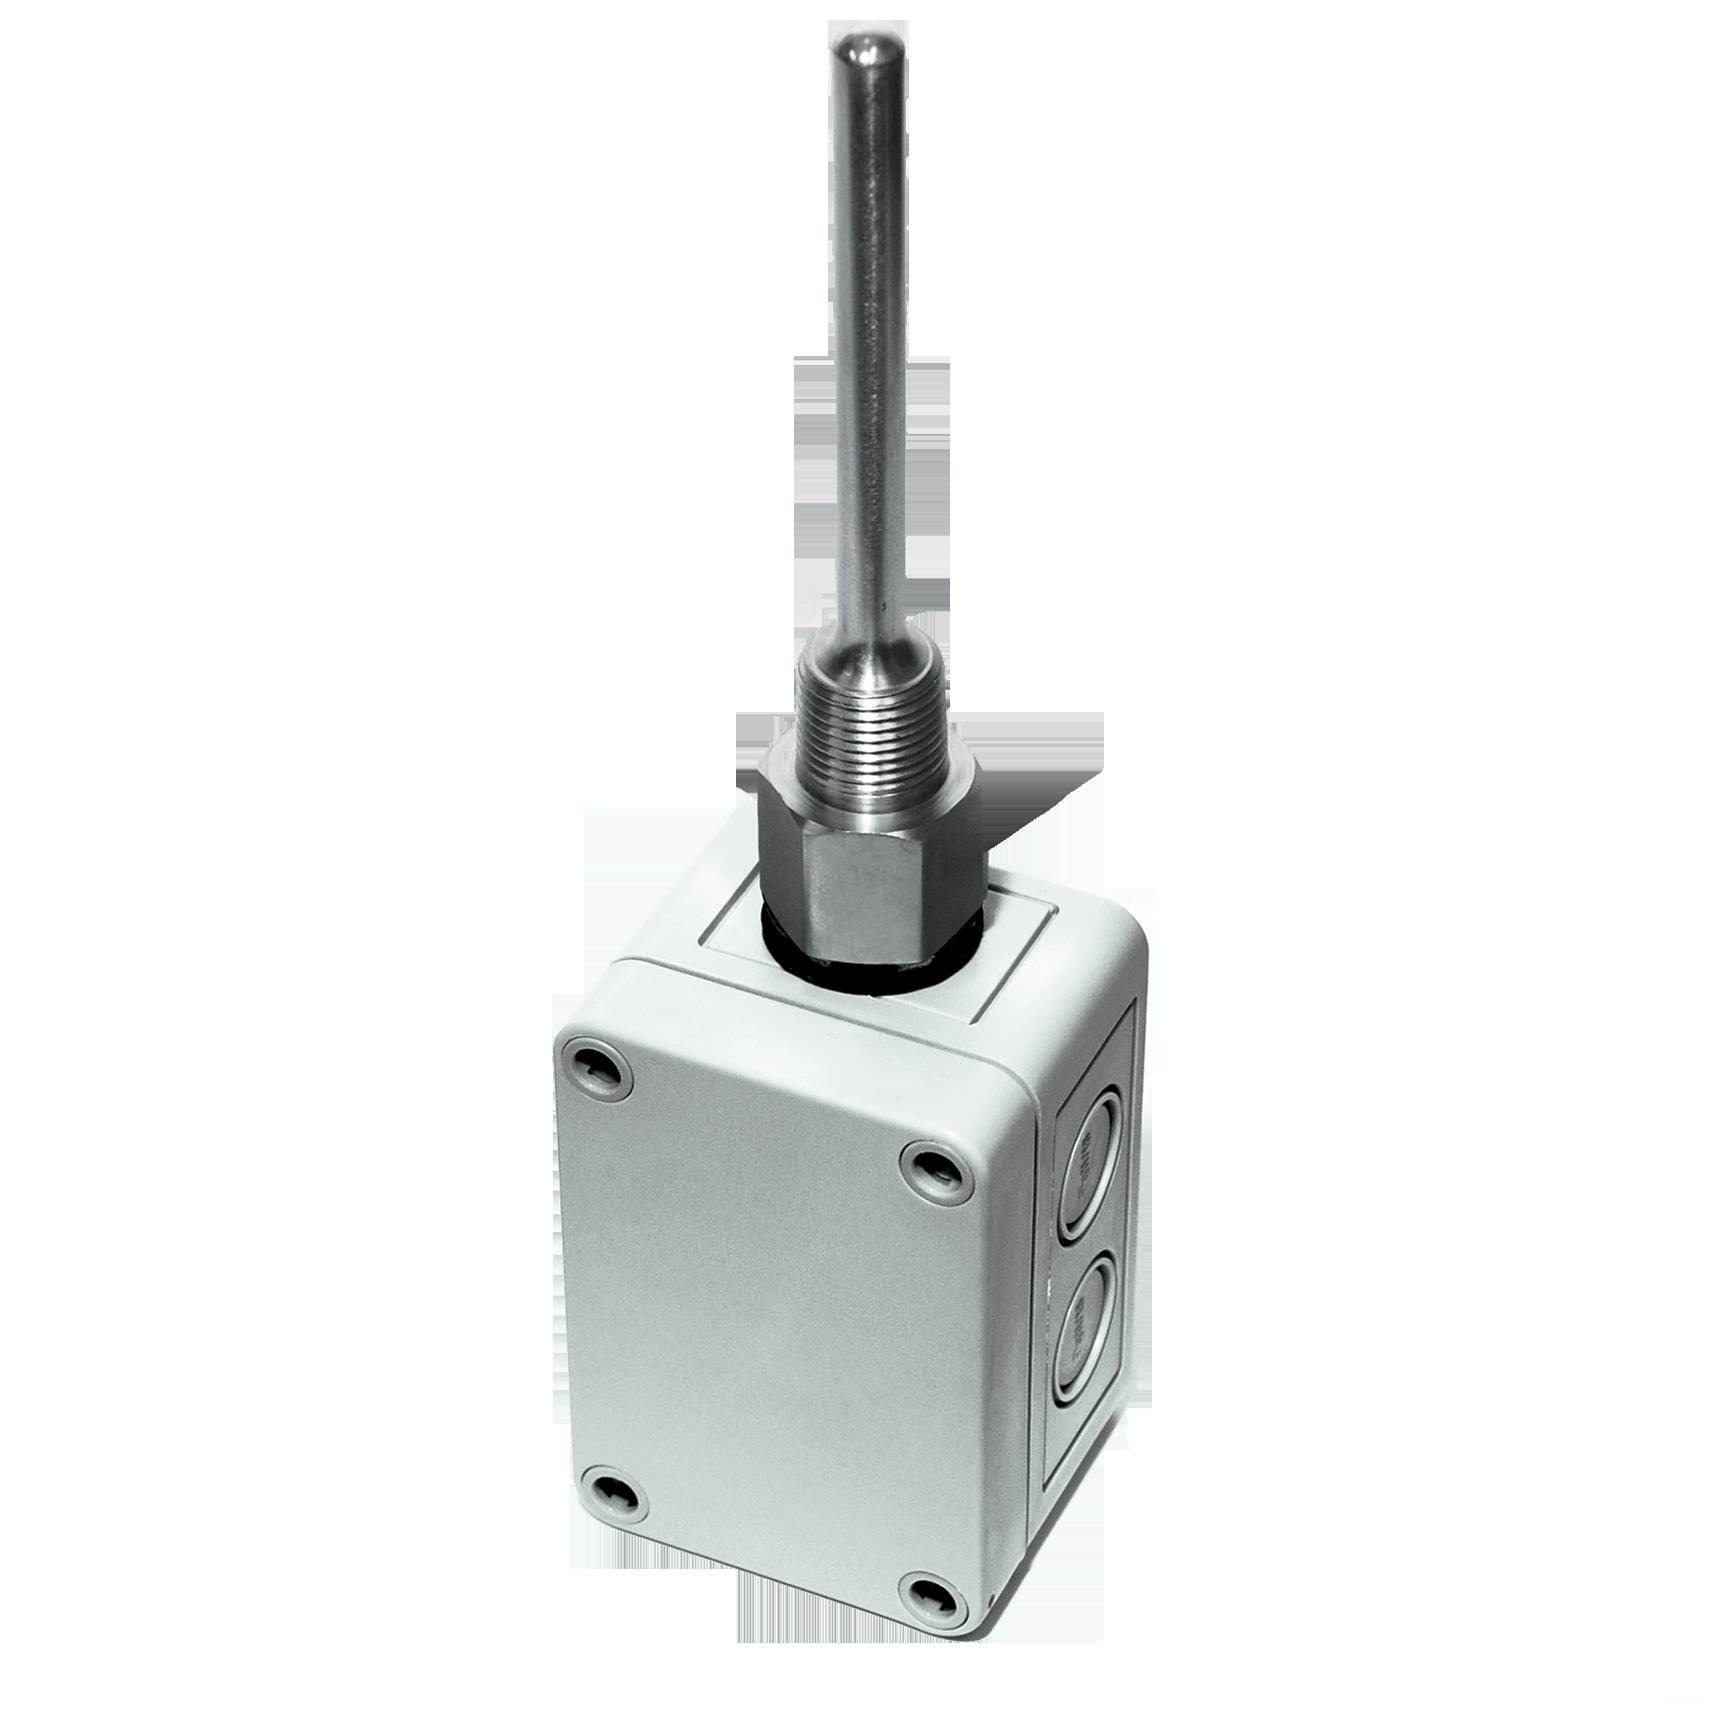 Aci A An Bc Im 6 4x Immersion Temperature Sensor